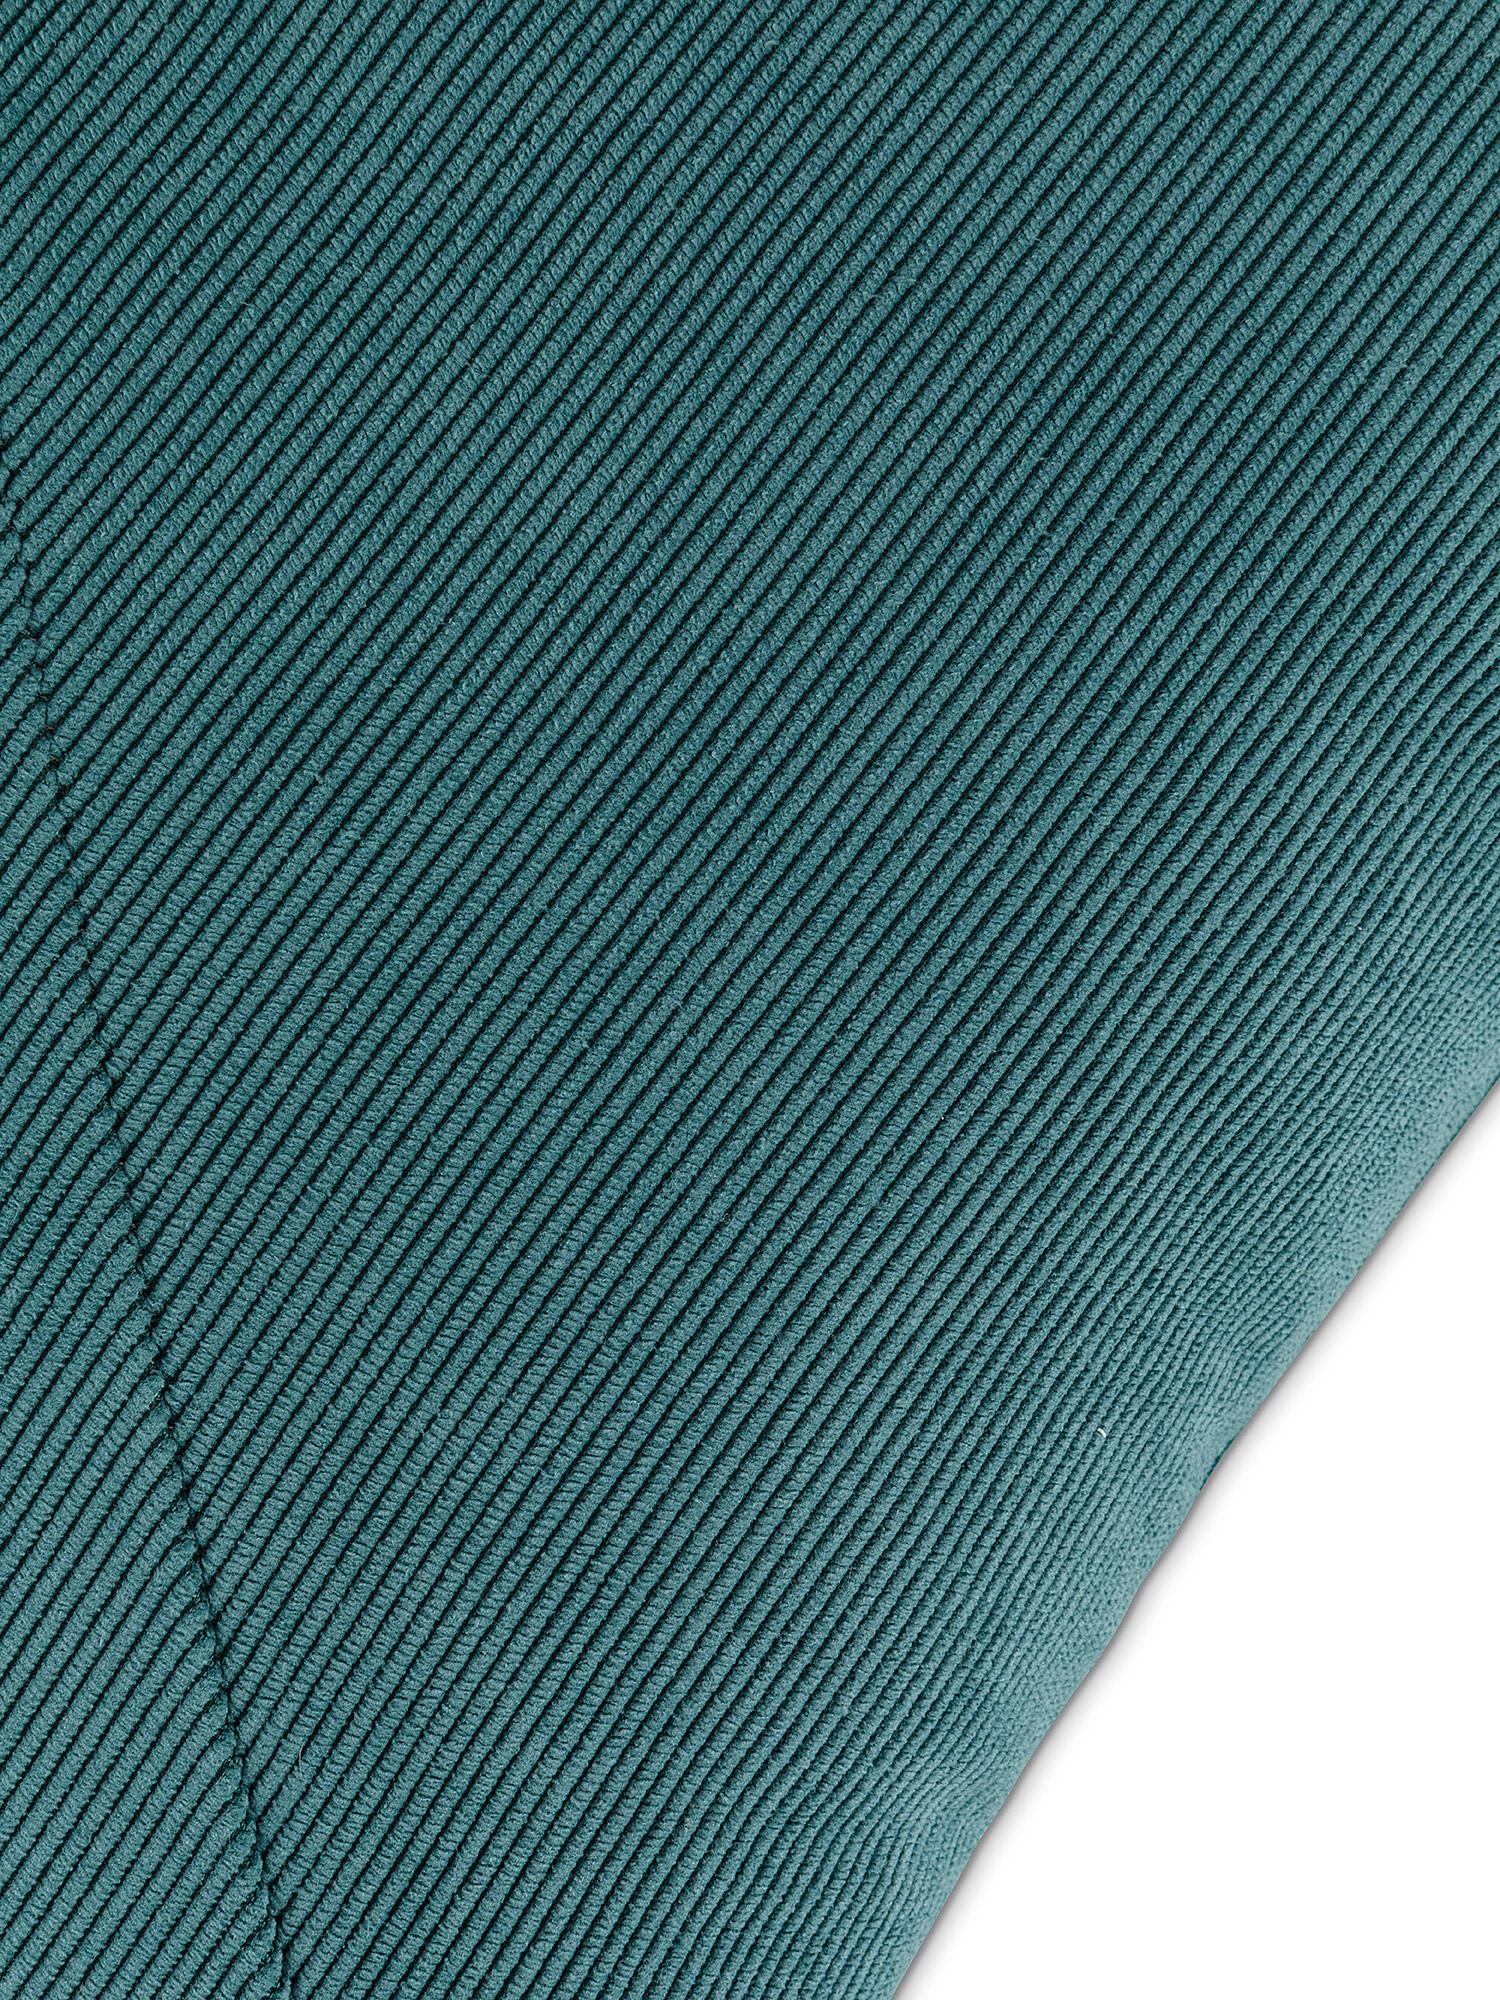 Cuscino velluto a costine 45x45cm, Petrolio, large image number 2